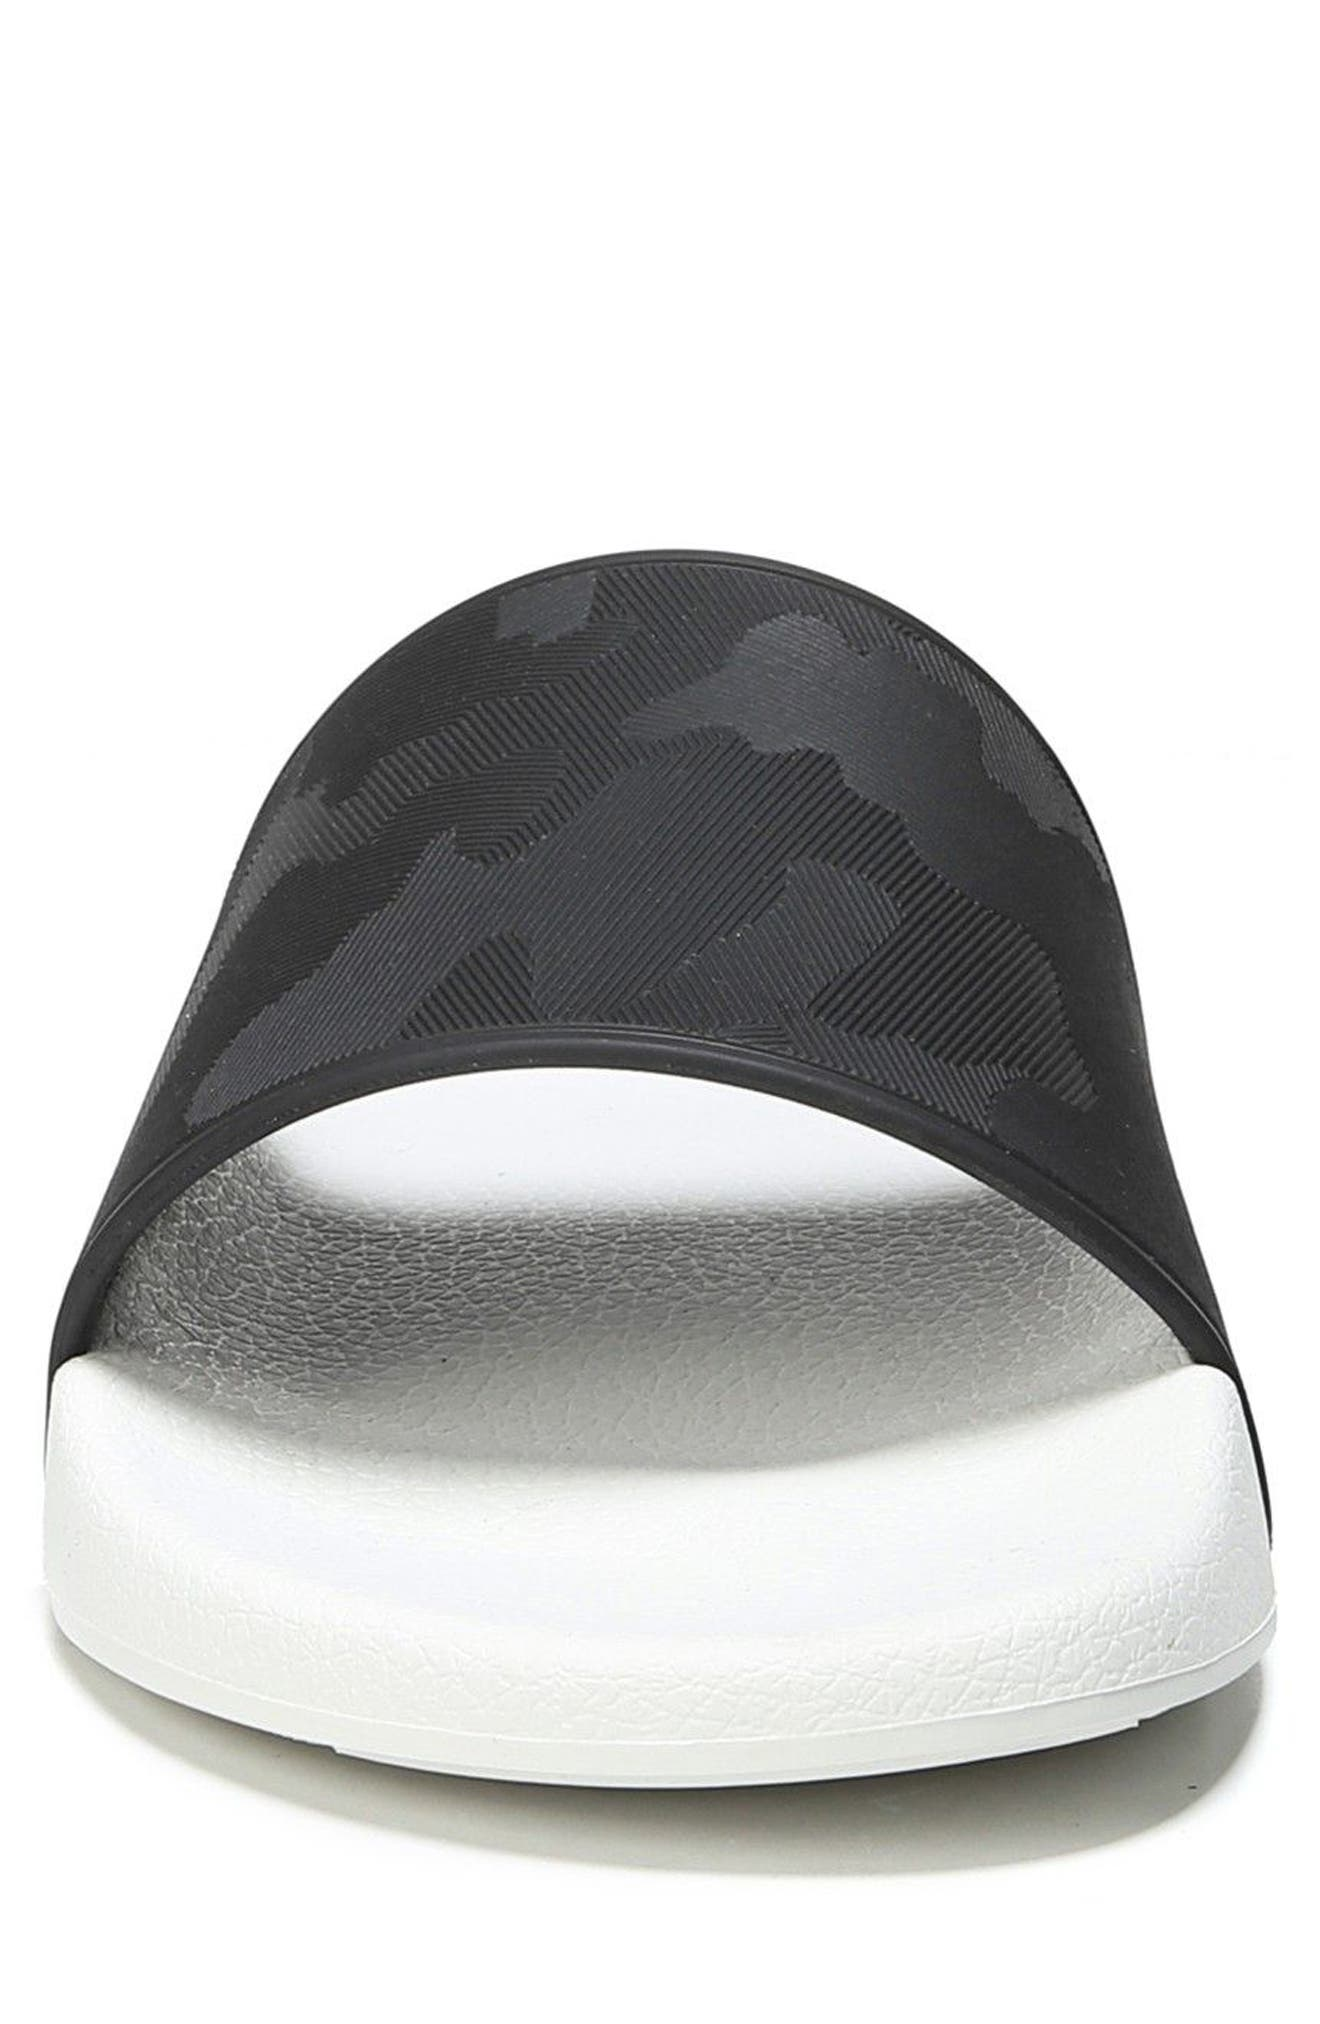 Westcoast-2 Slide Sandal,                             Alternate thumbnail 4, color,                             Black